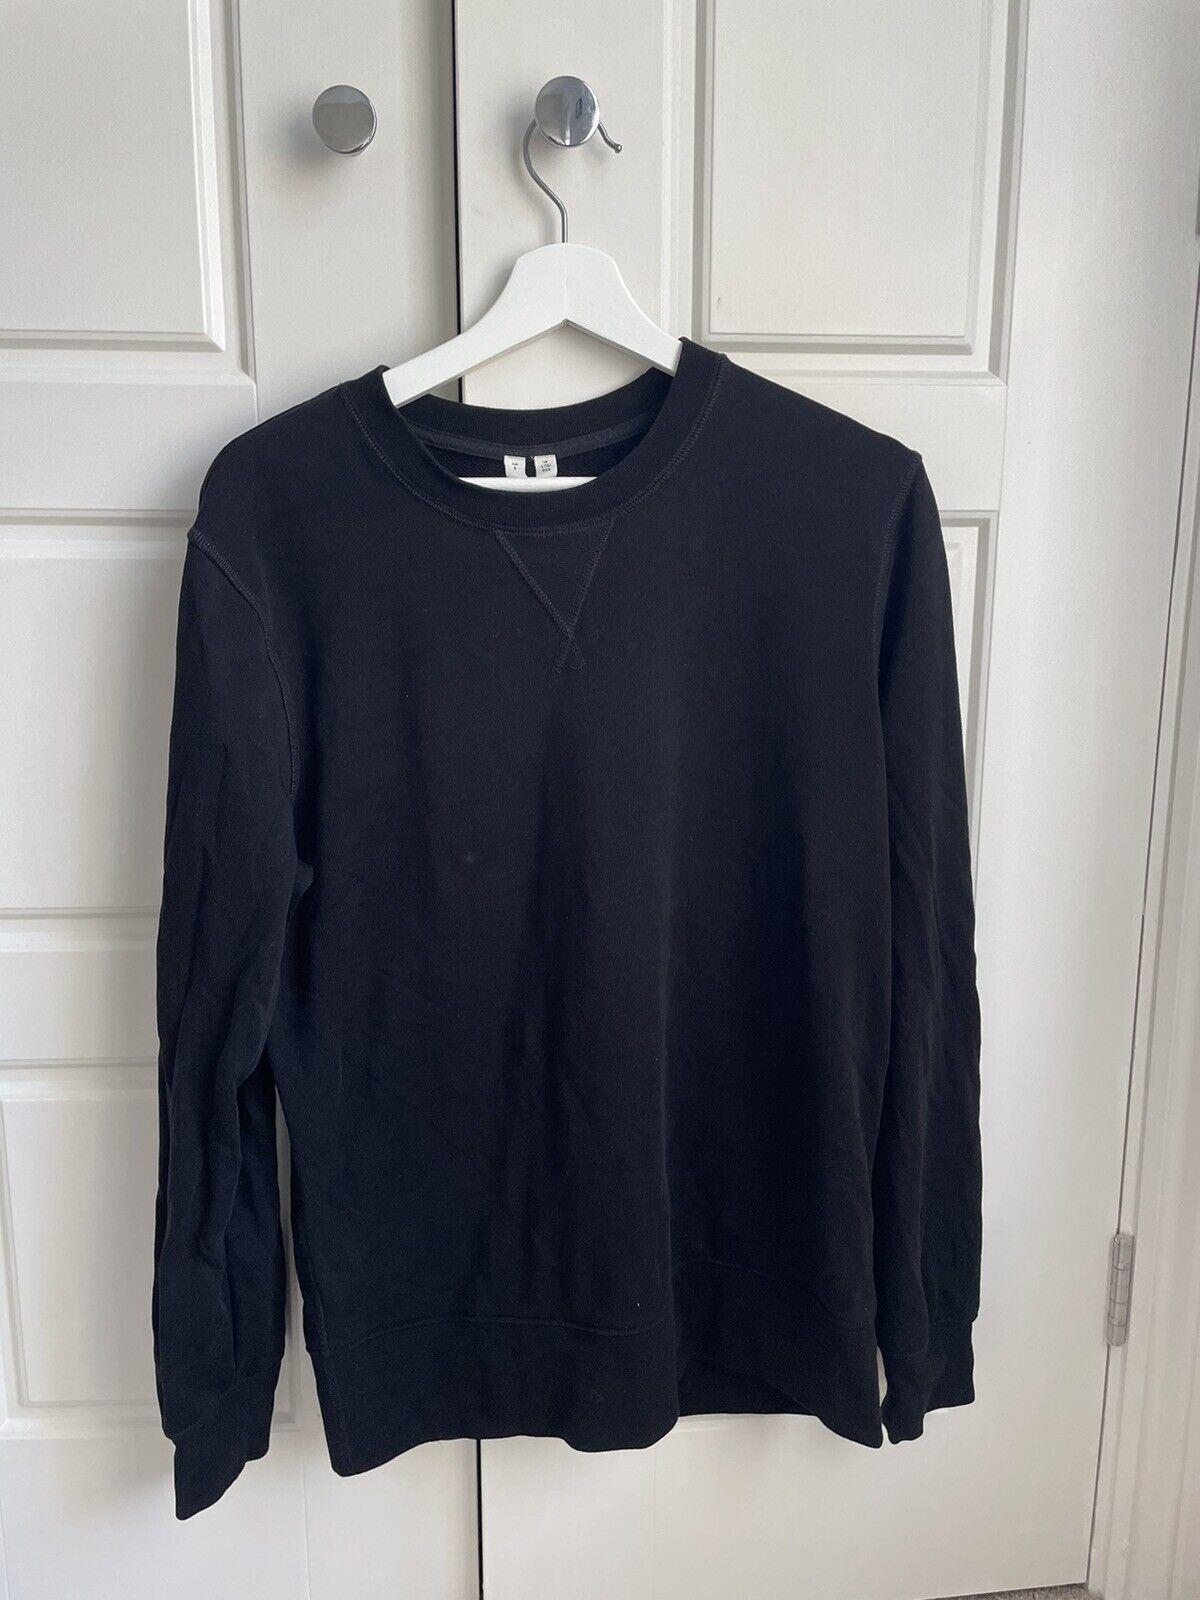 Arket - Black Swearshirt Size Small